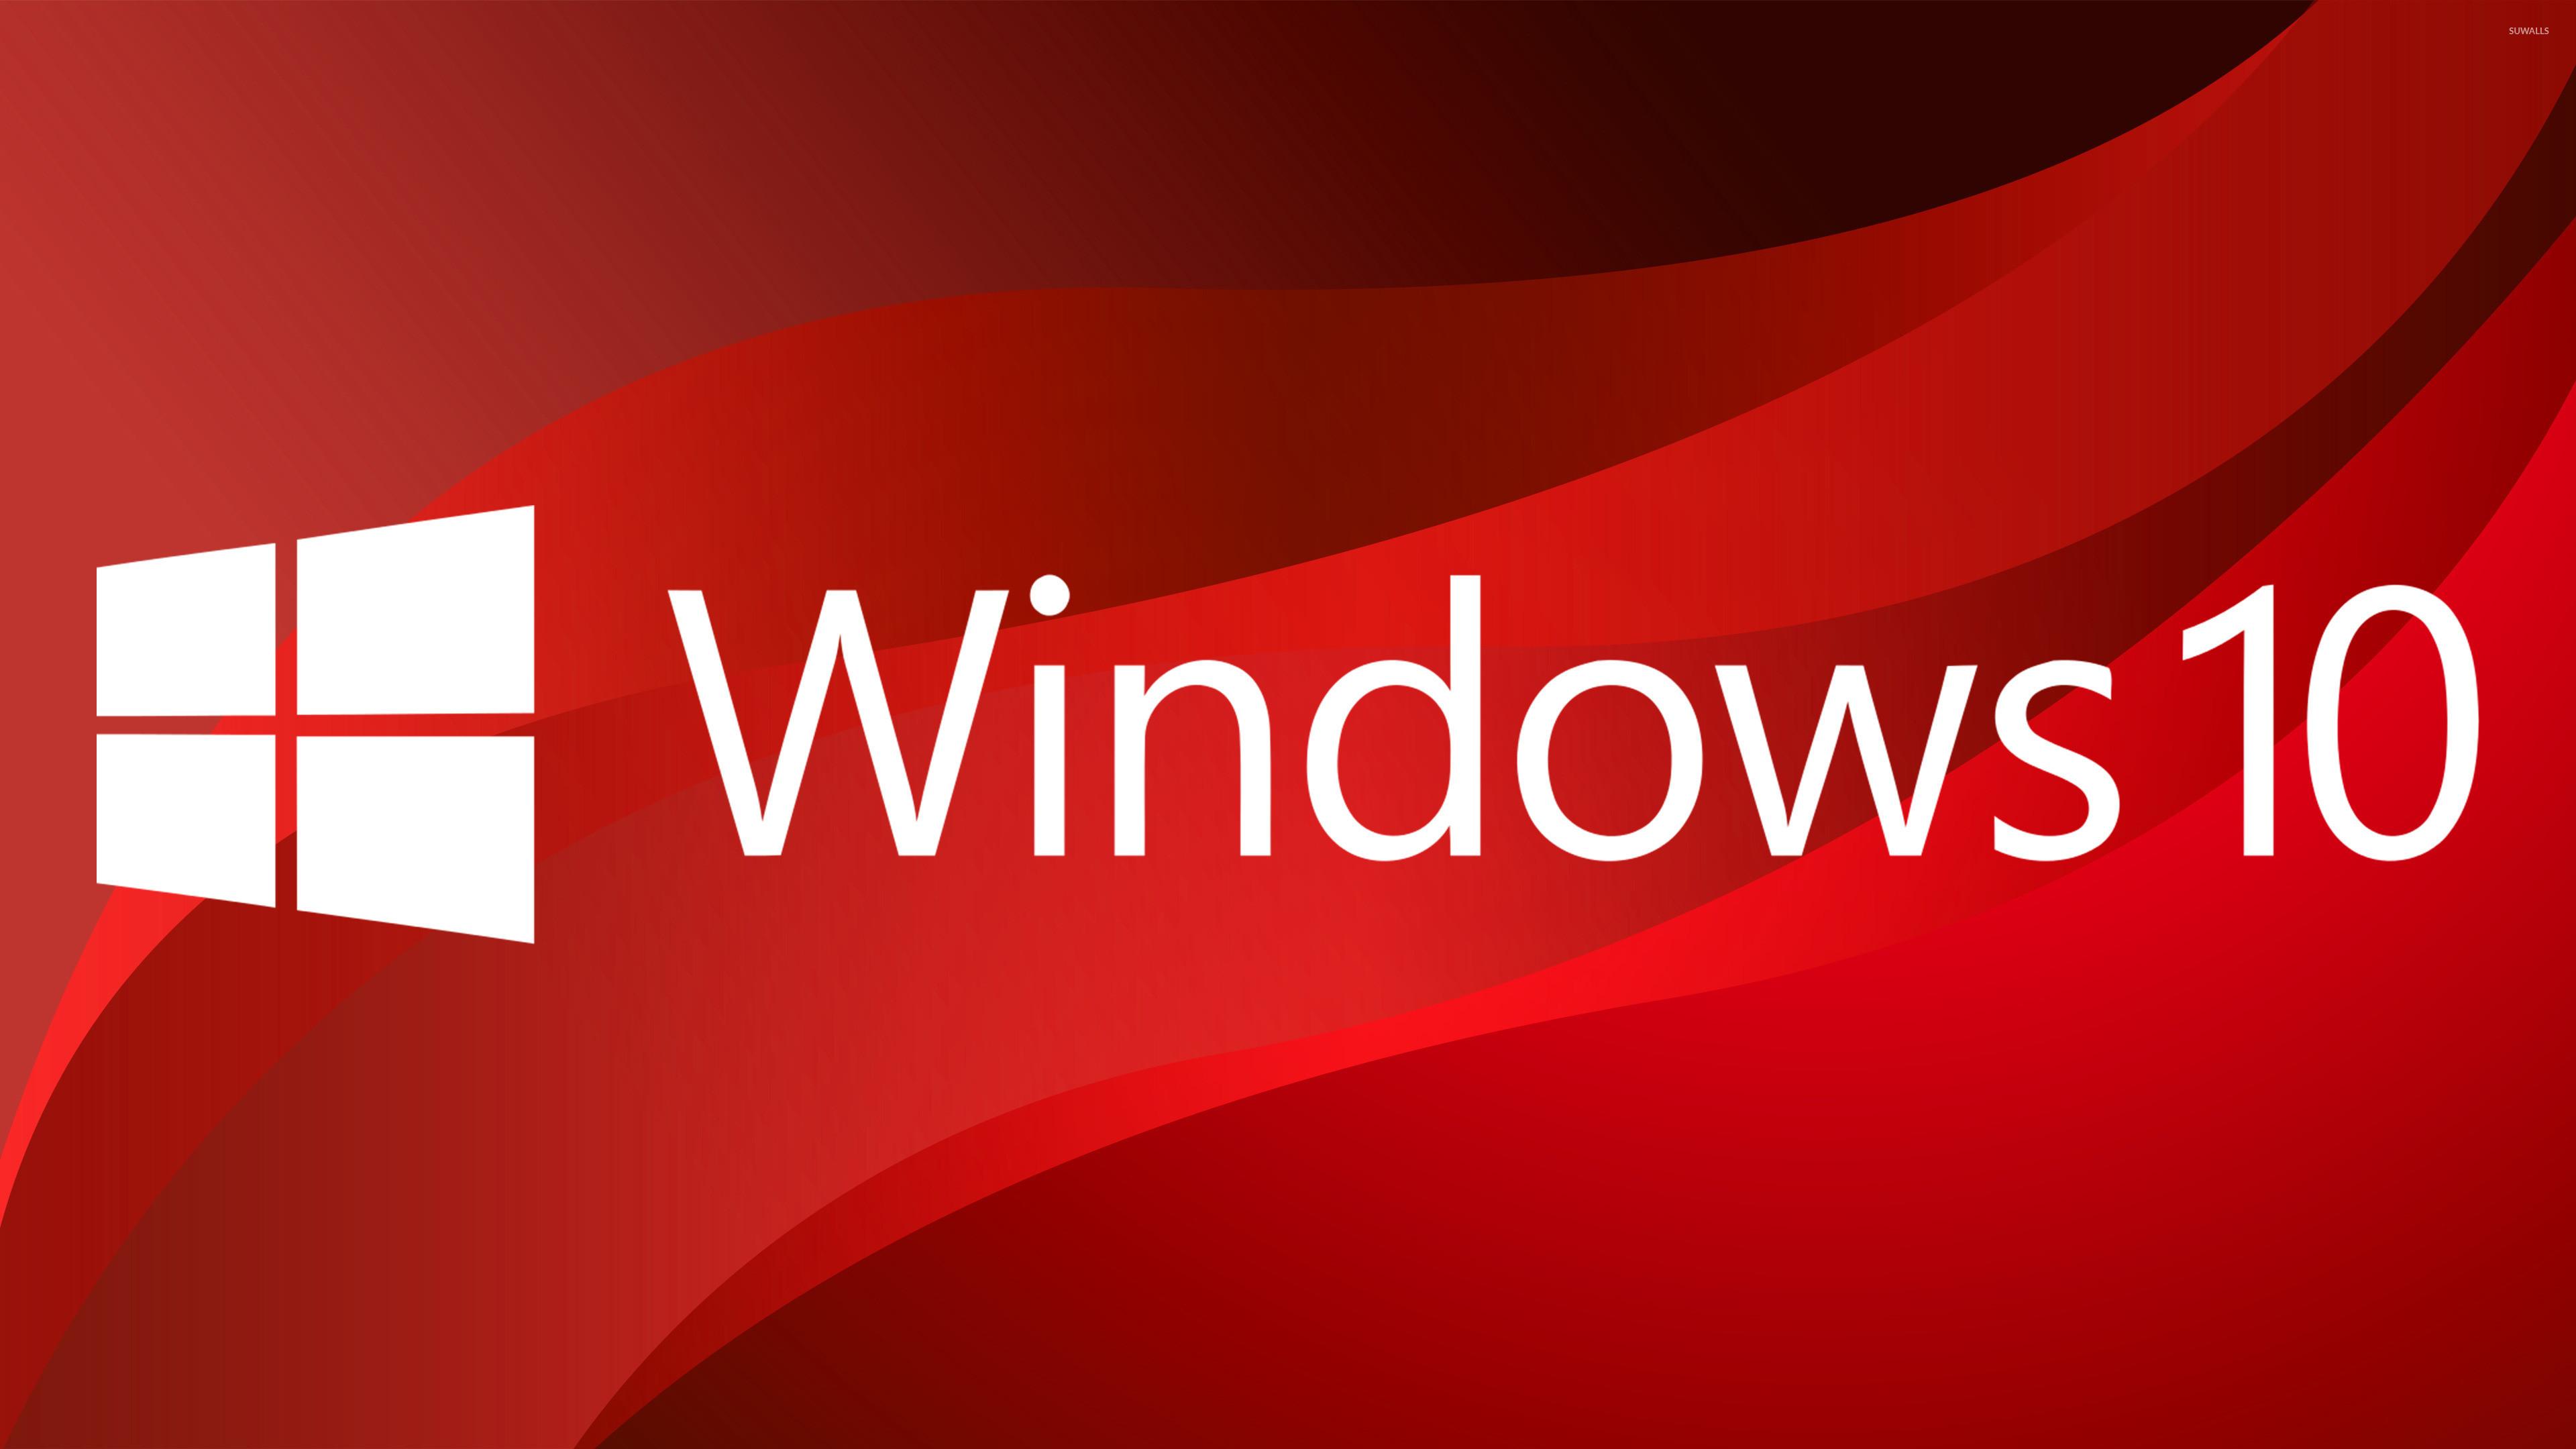 Windows 10 big white logo on red curves wallpaper